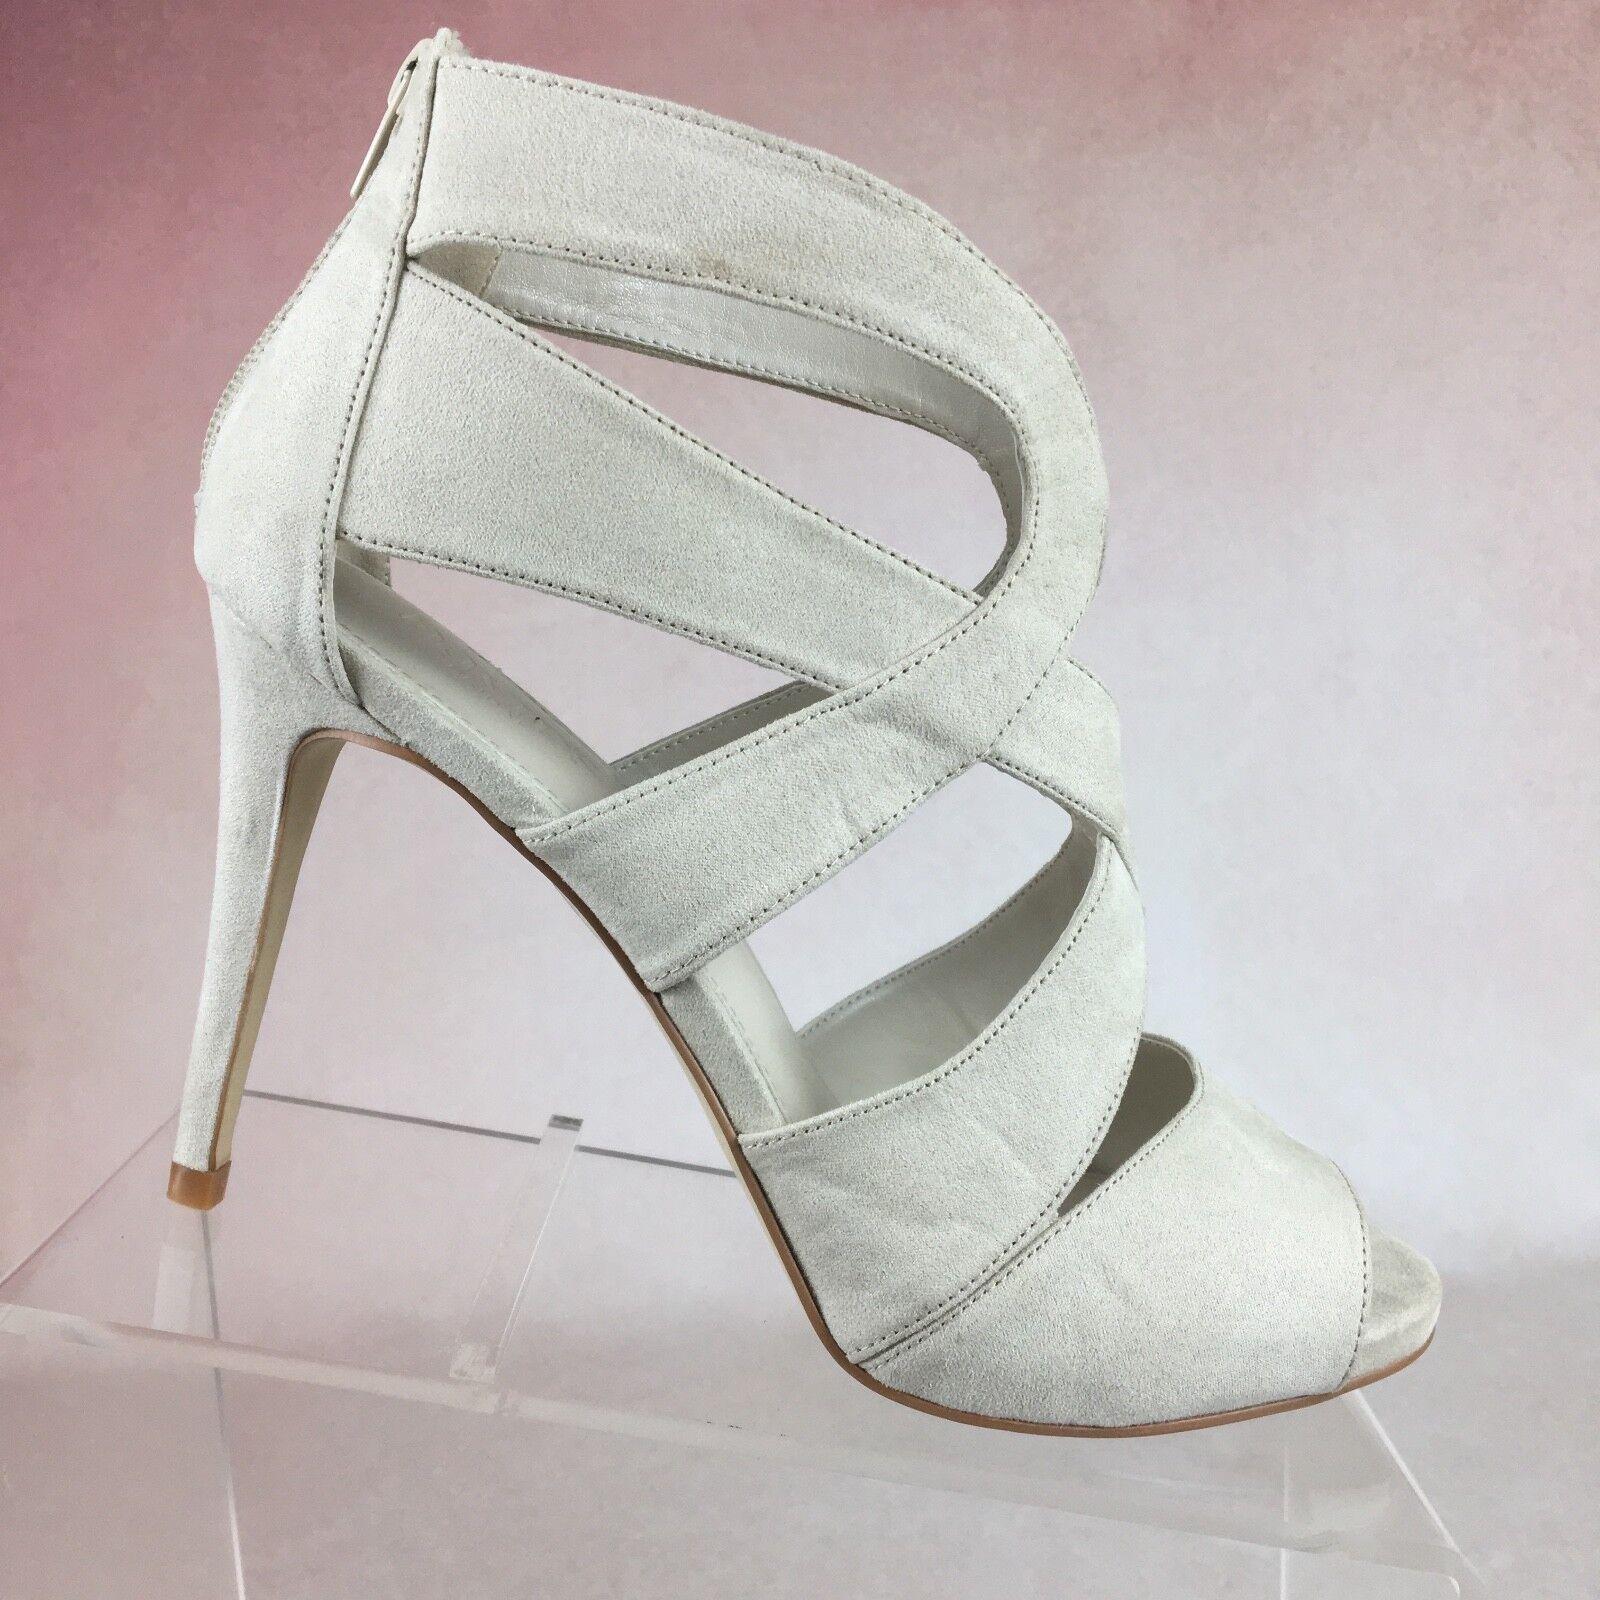 DAVID's BRIDAL Keira Beige Strappy Stiletto Heels 10M Back Zipper Shoes Women's 10M Heels 3d820b